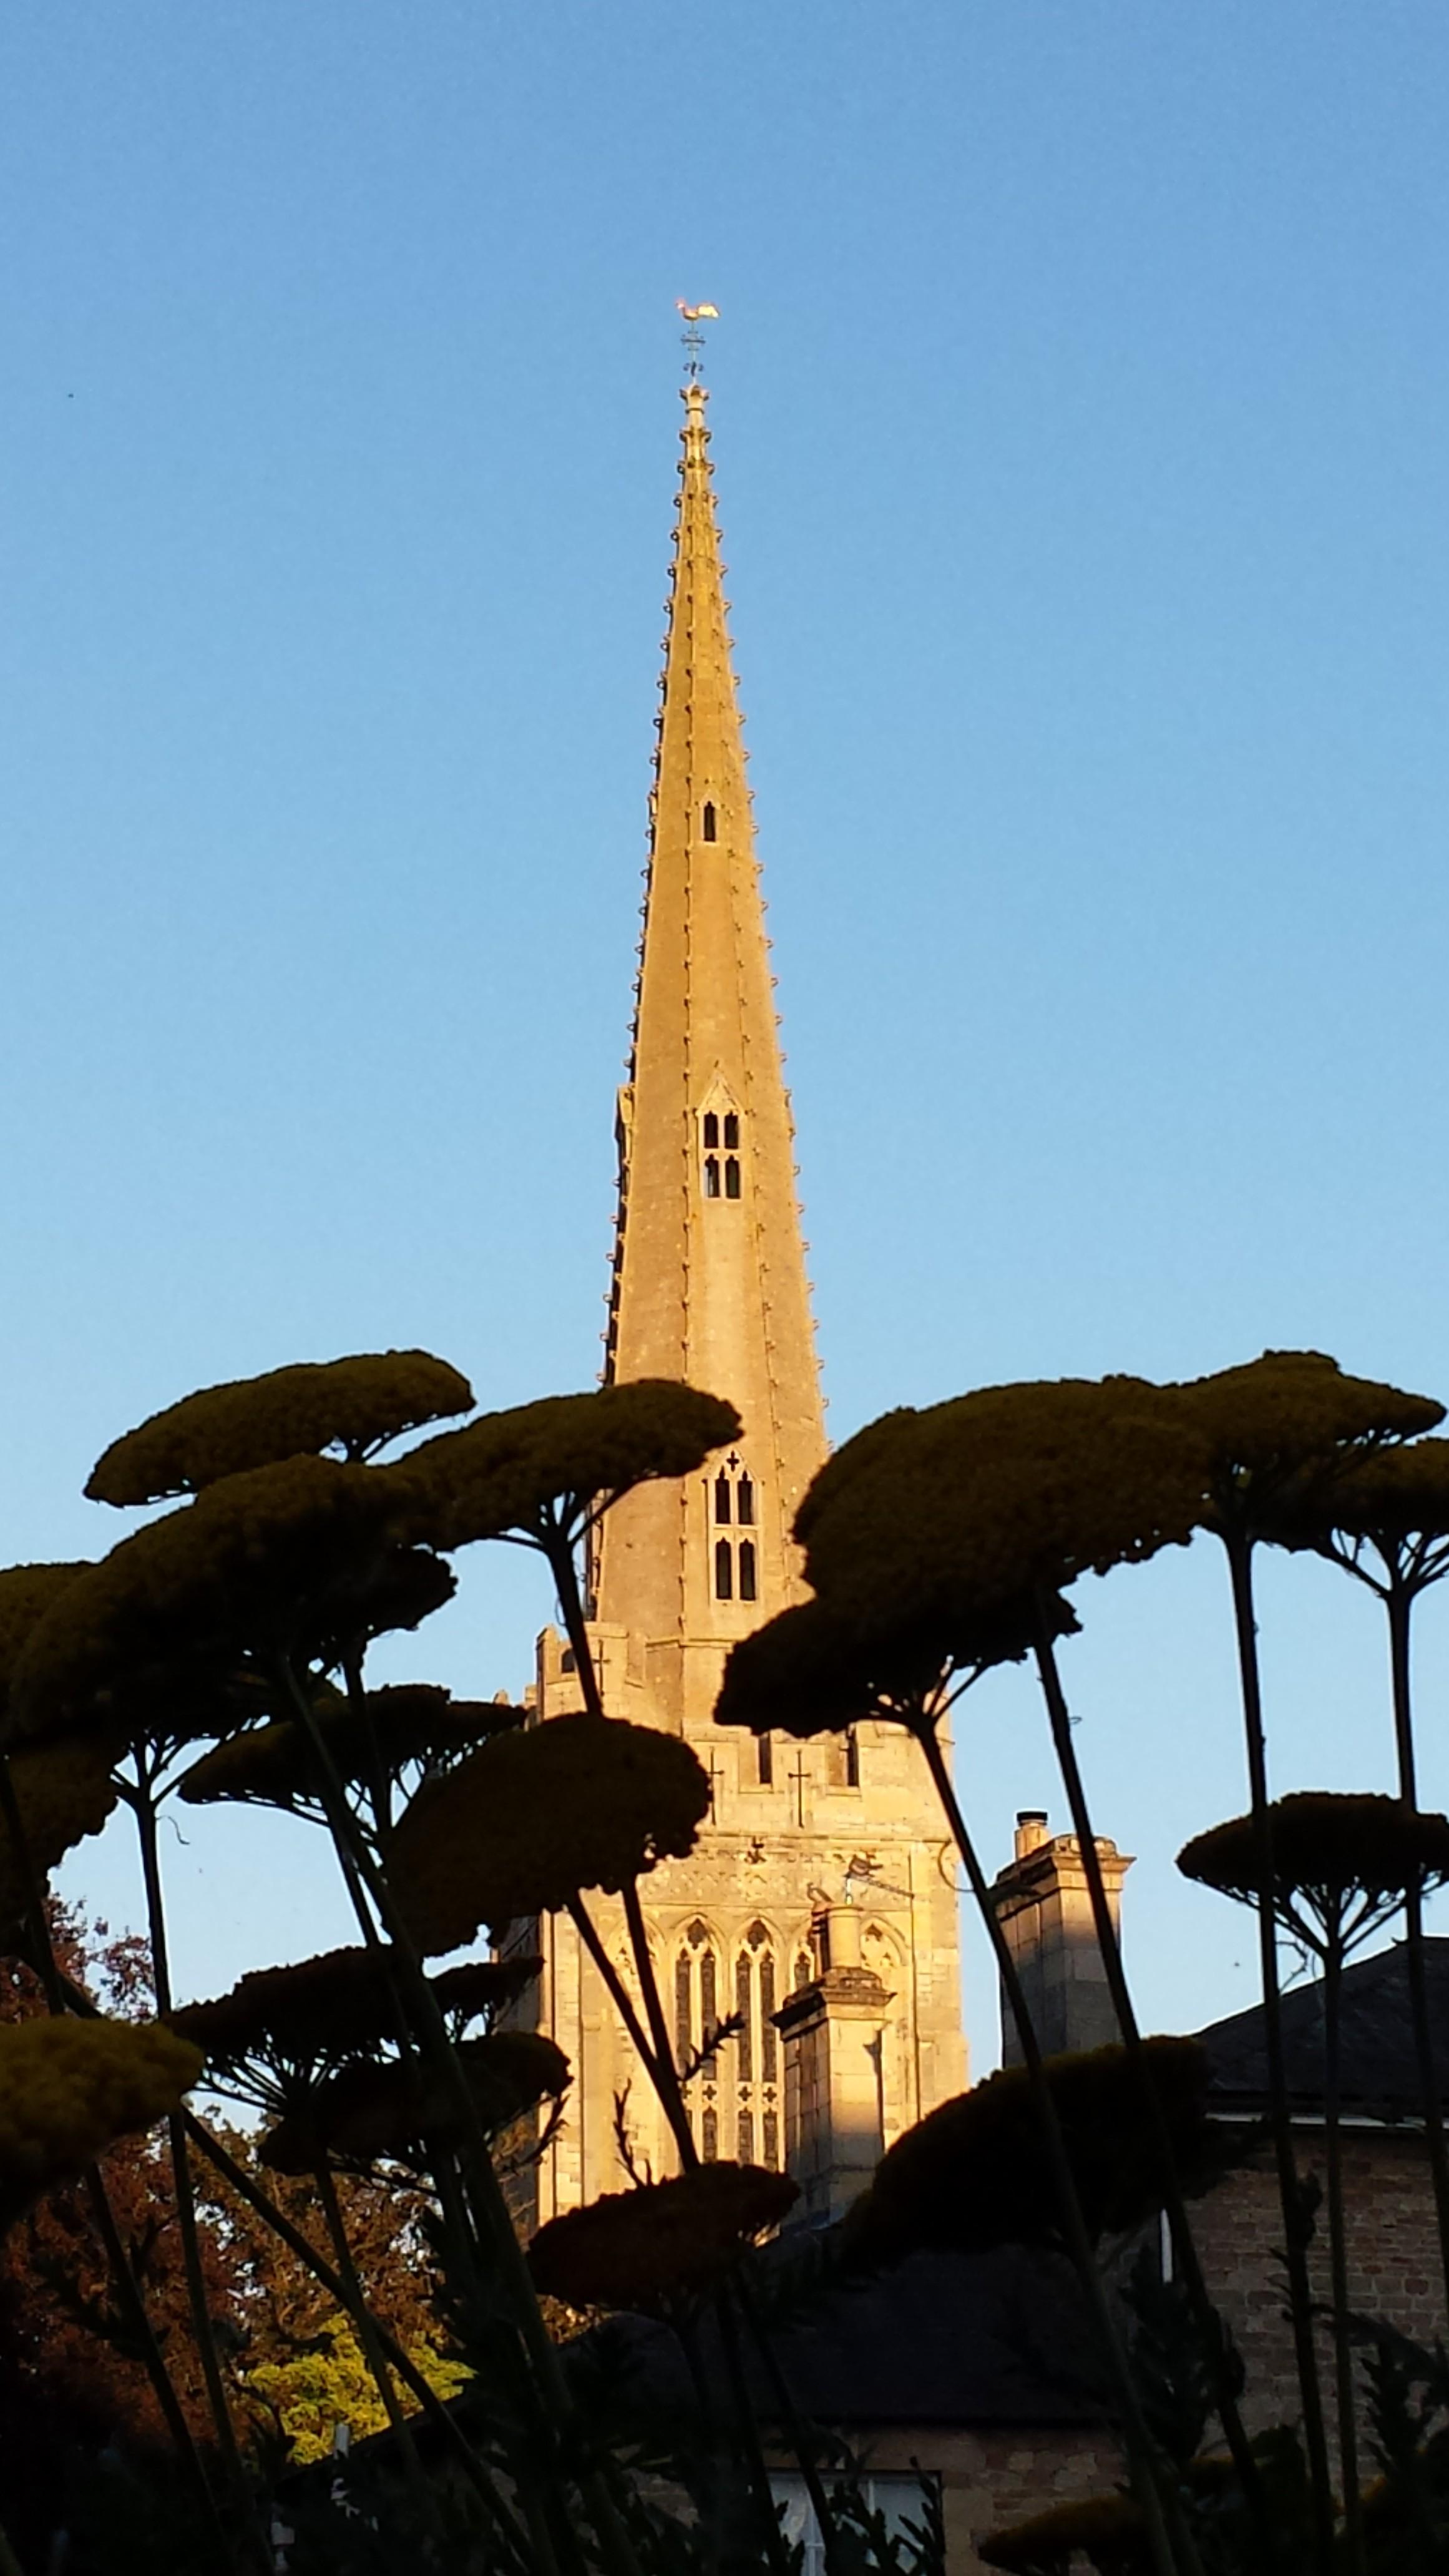 Winner: William Gunson, St Peter's Church, Oundle, Northamptonshire